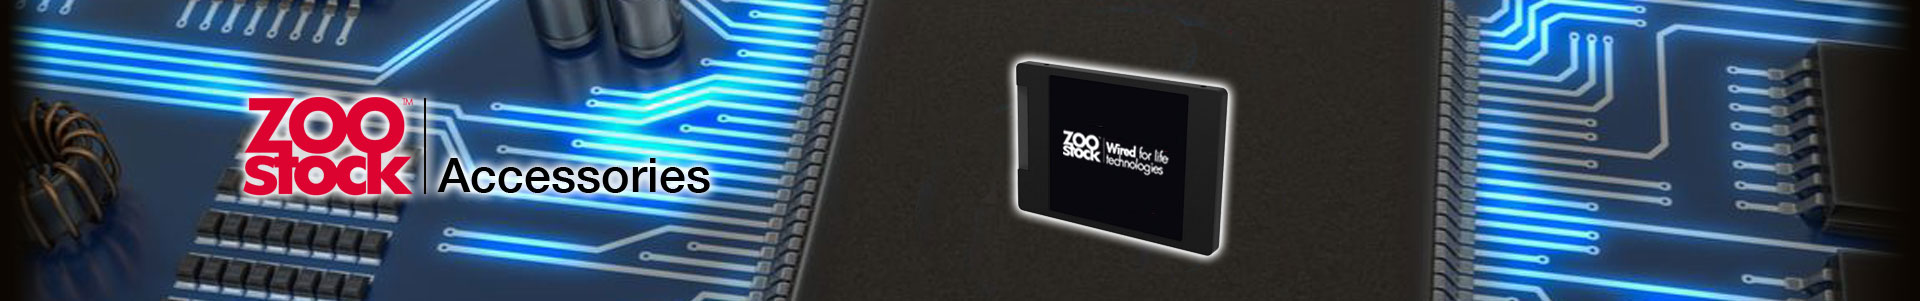 hard disk zoostock